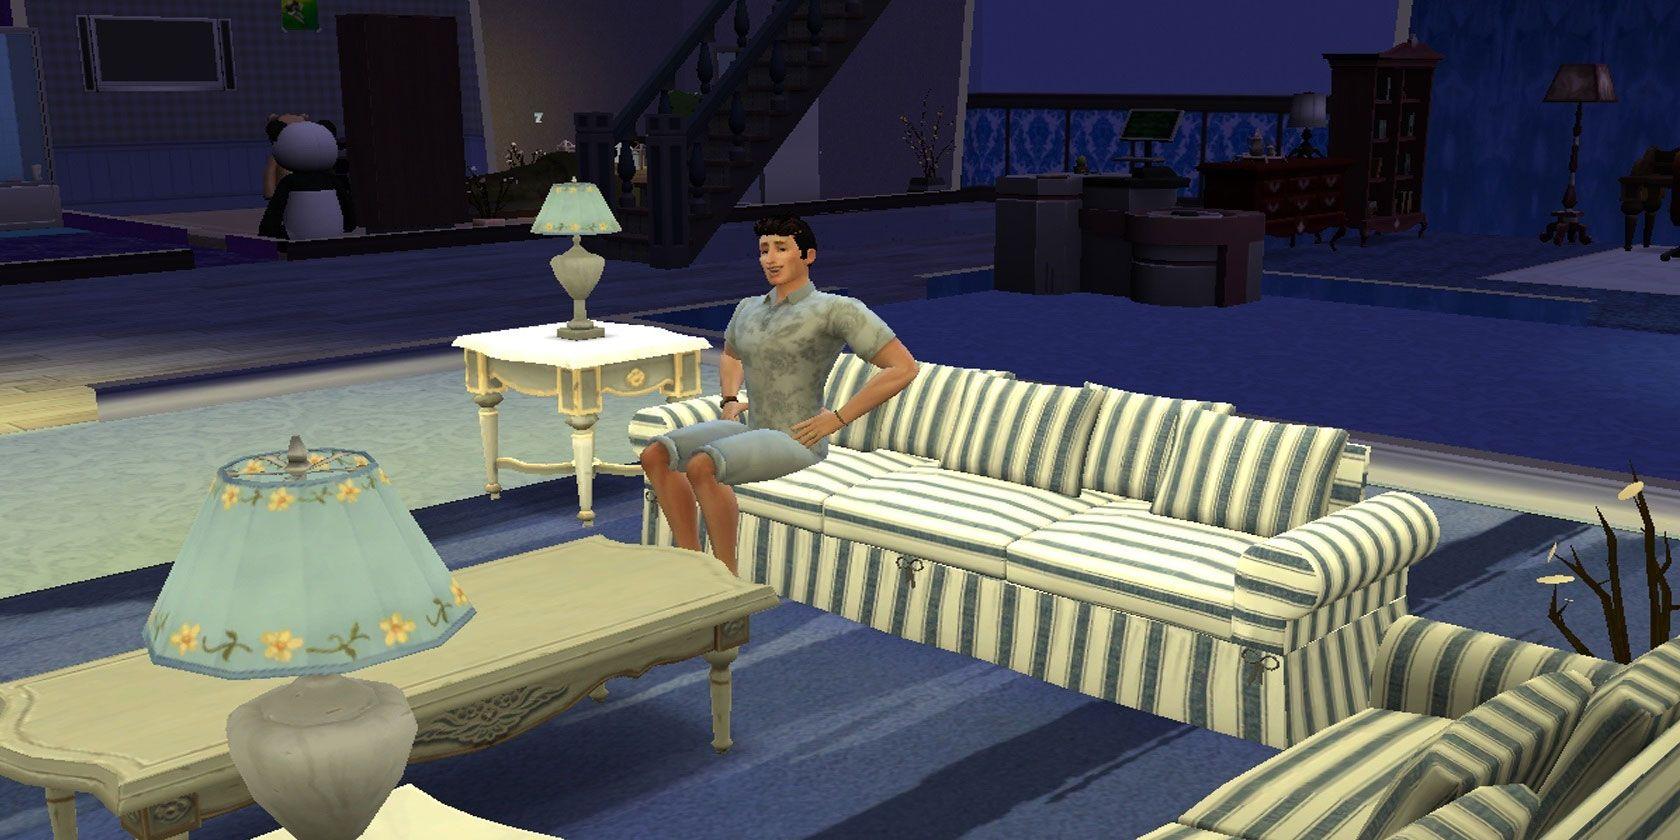 Sims 4: All Money Cheats